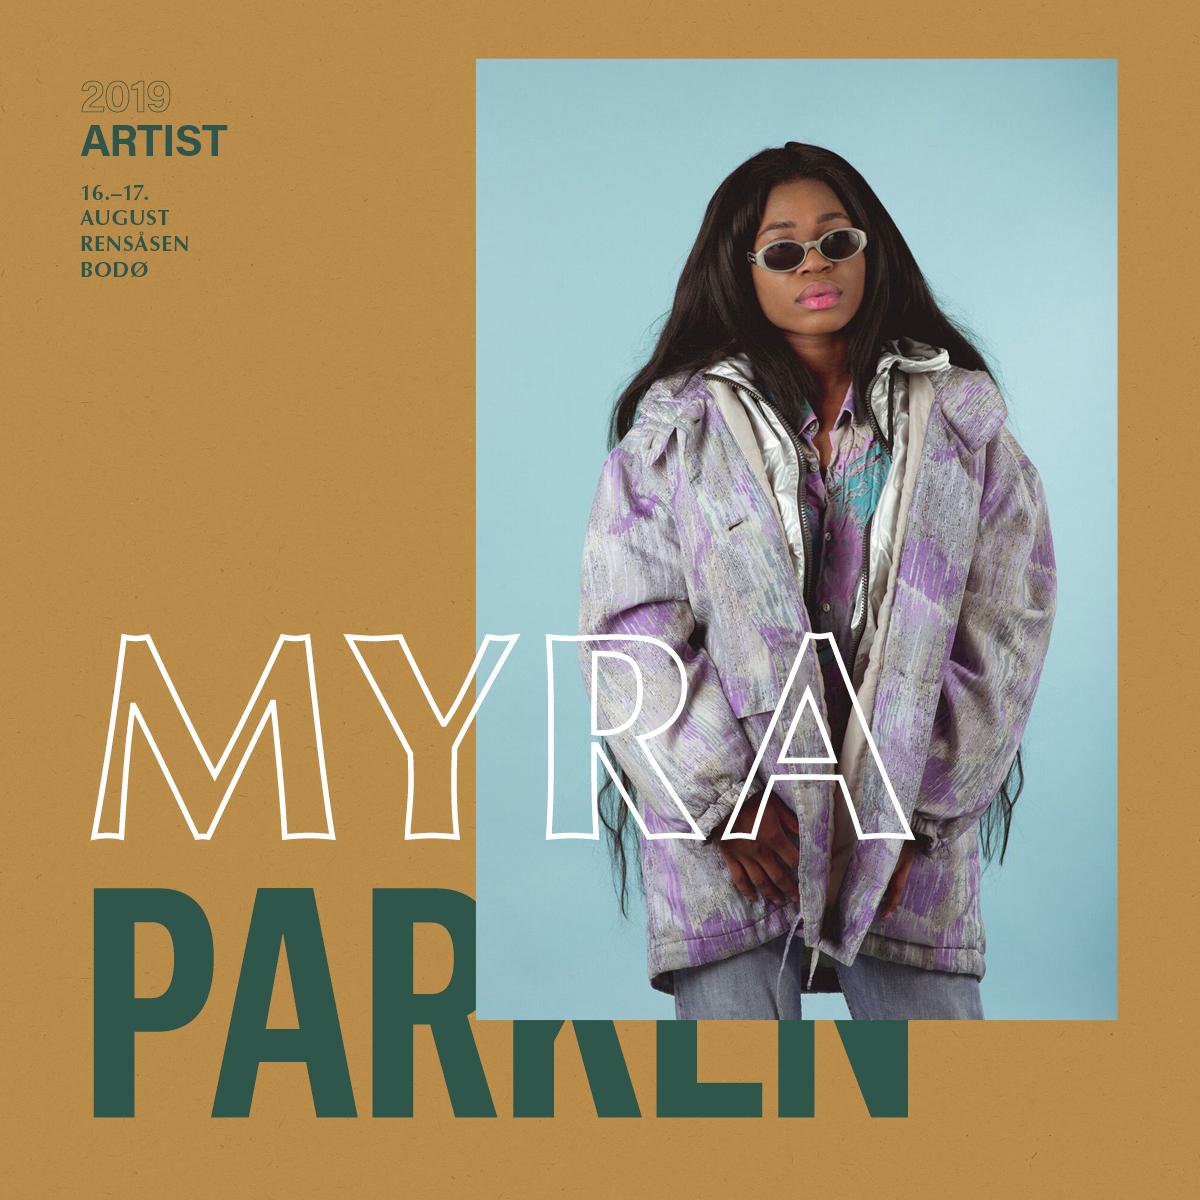 Myra -